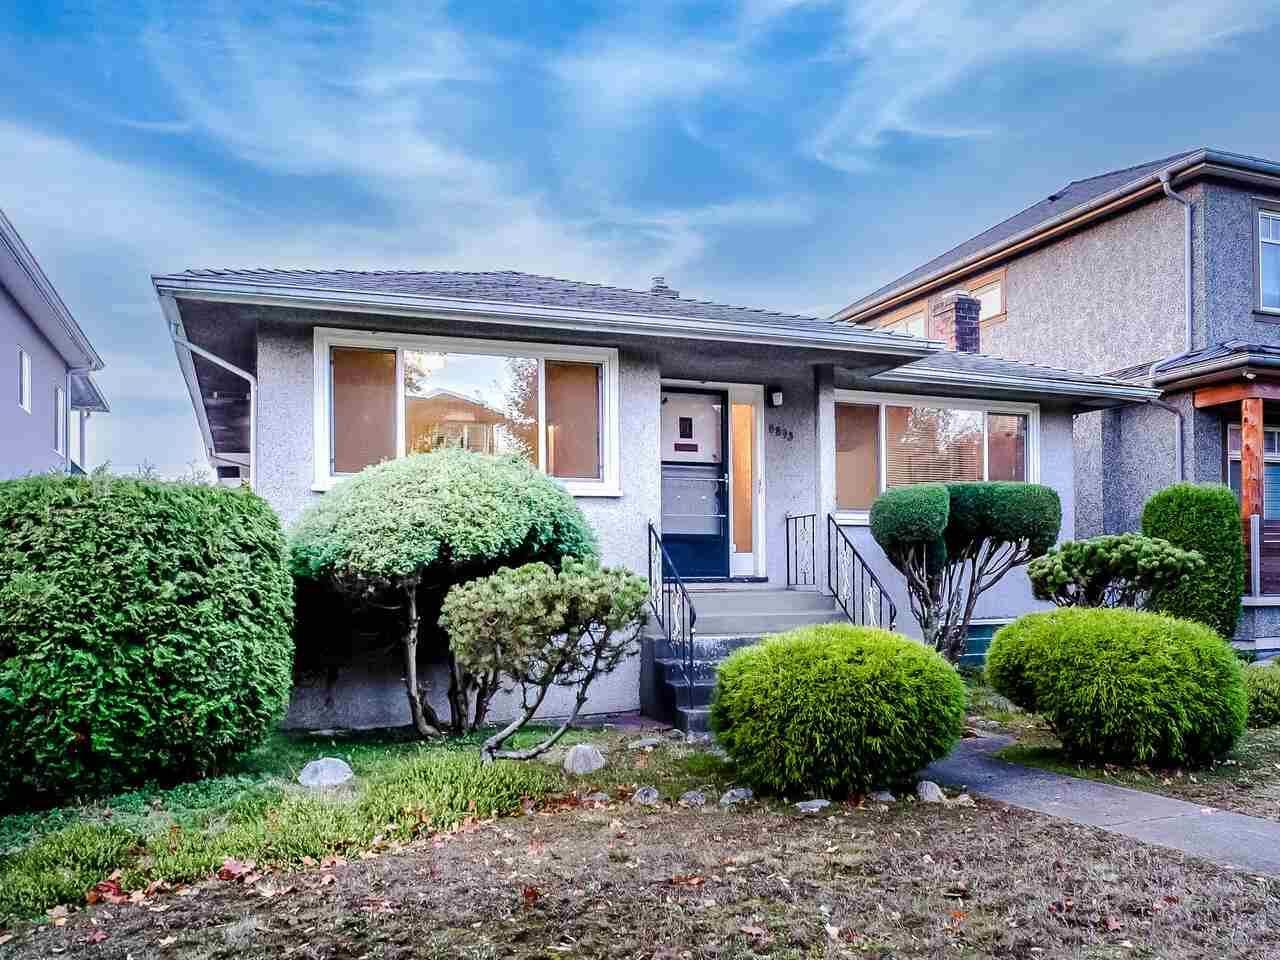 Main Photo: 6893 KILLARNEY Street in Vancouver: Killarney VE House for sale (Vancouver East)  : MLS®# R2515526